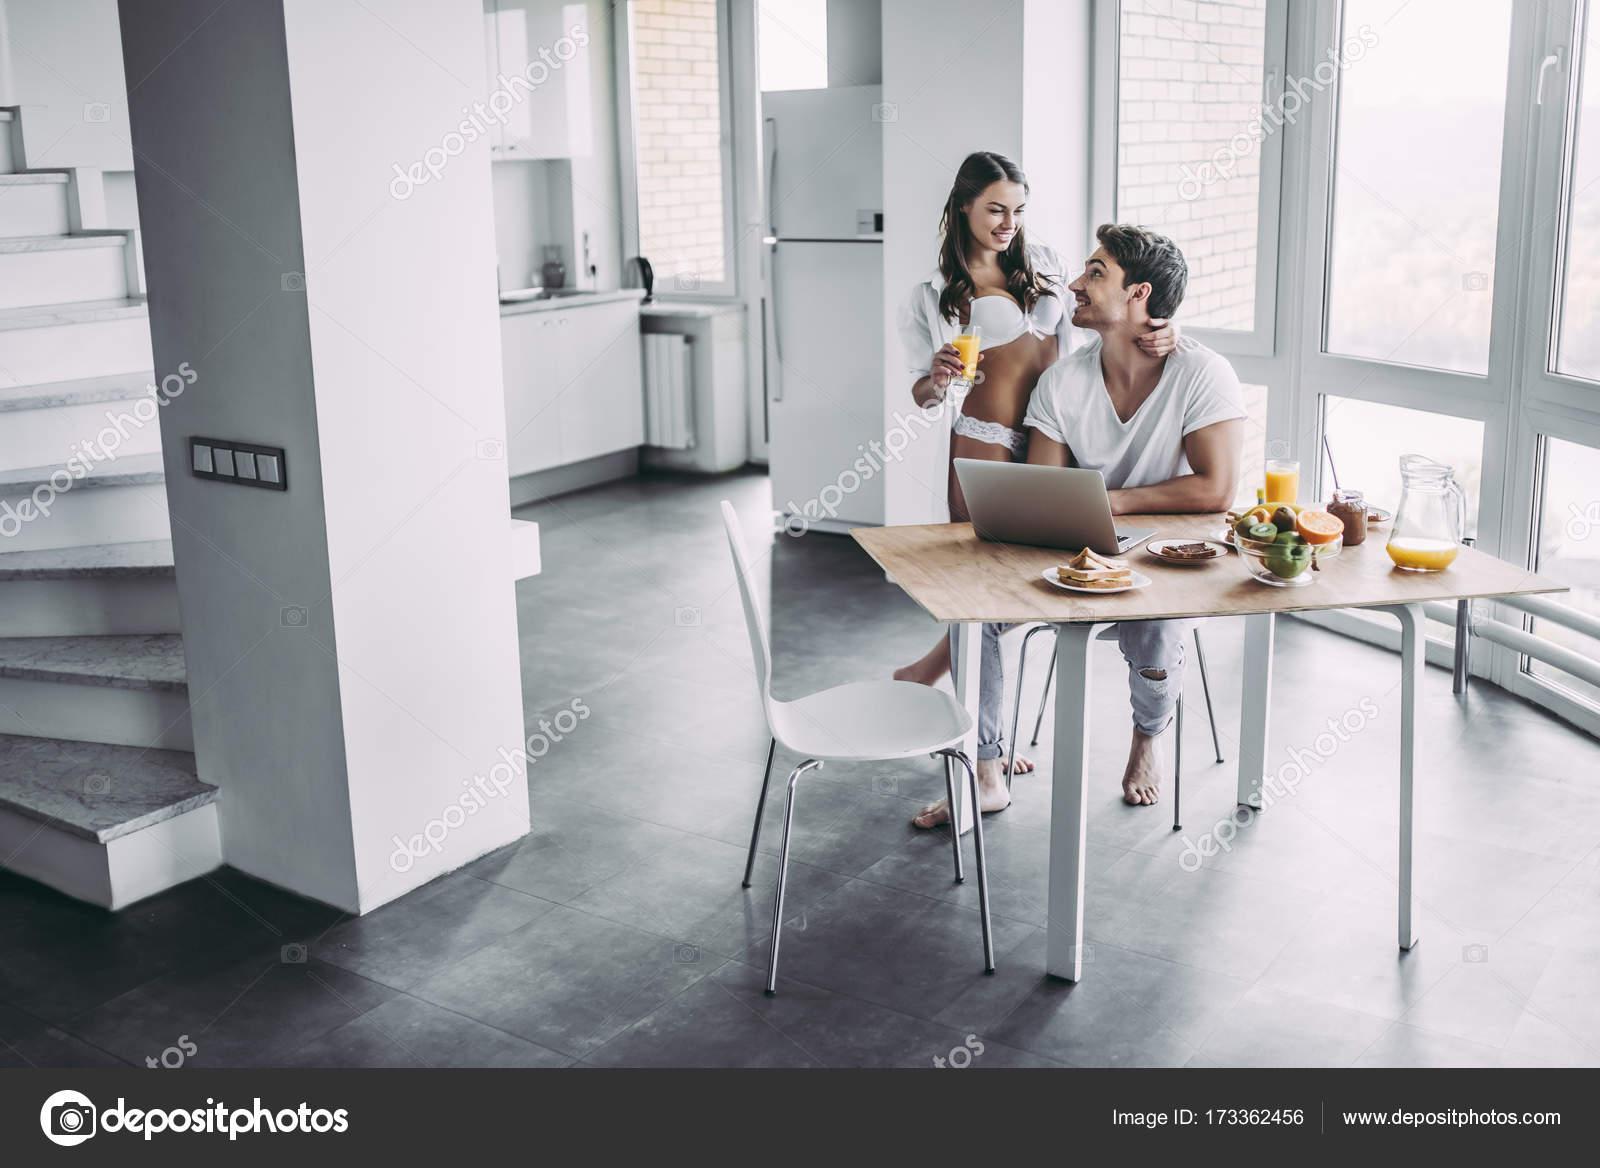 paar auf Küche — Stockfoto © 4pmphoto@gmail.com #173362456